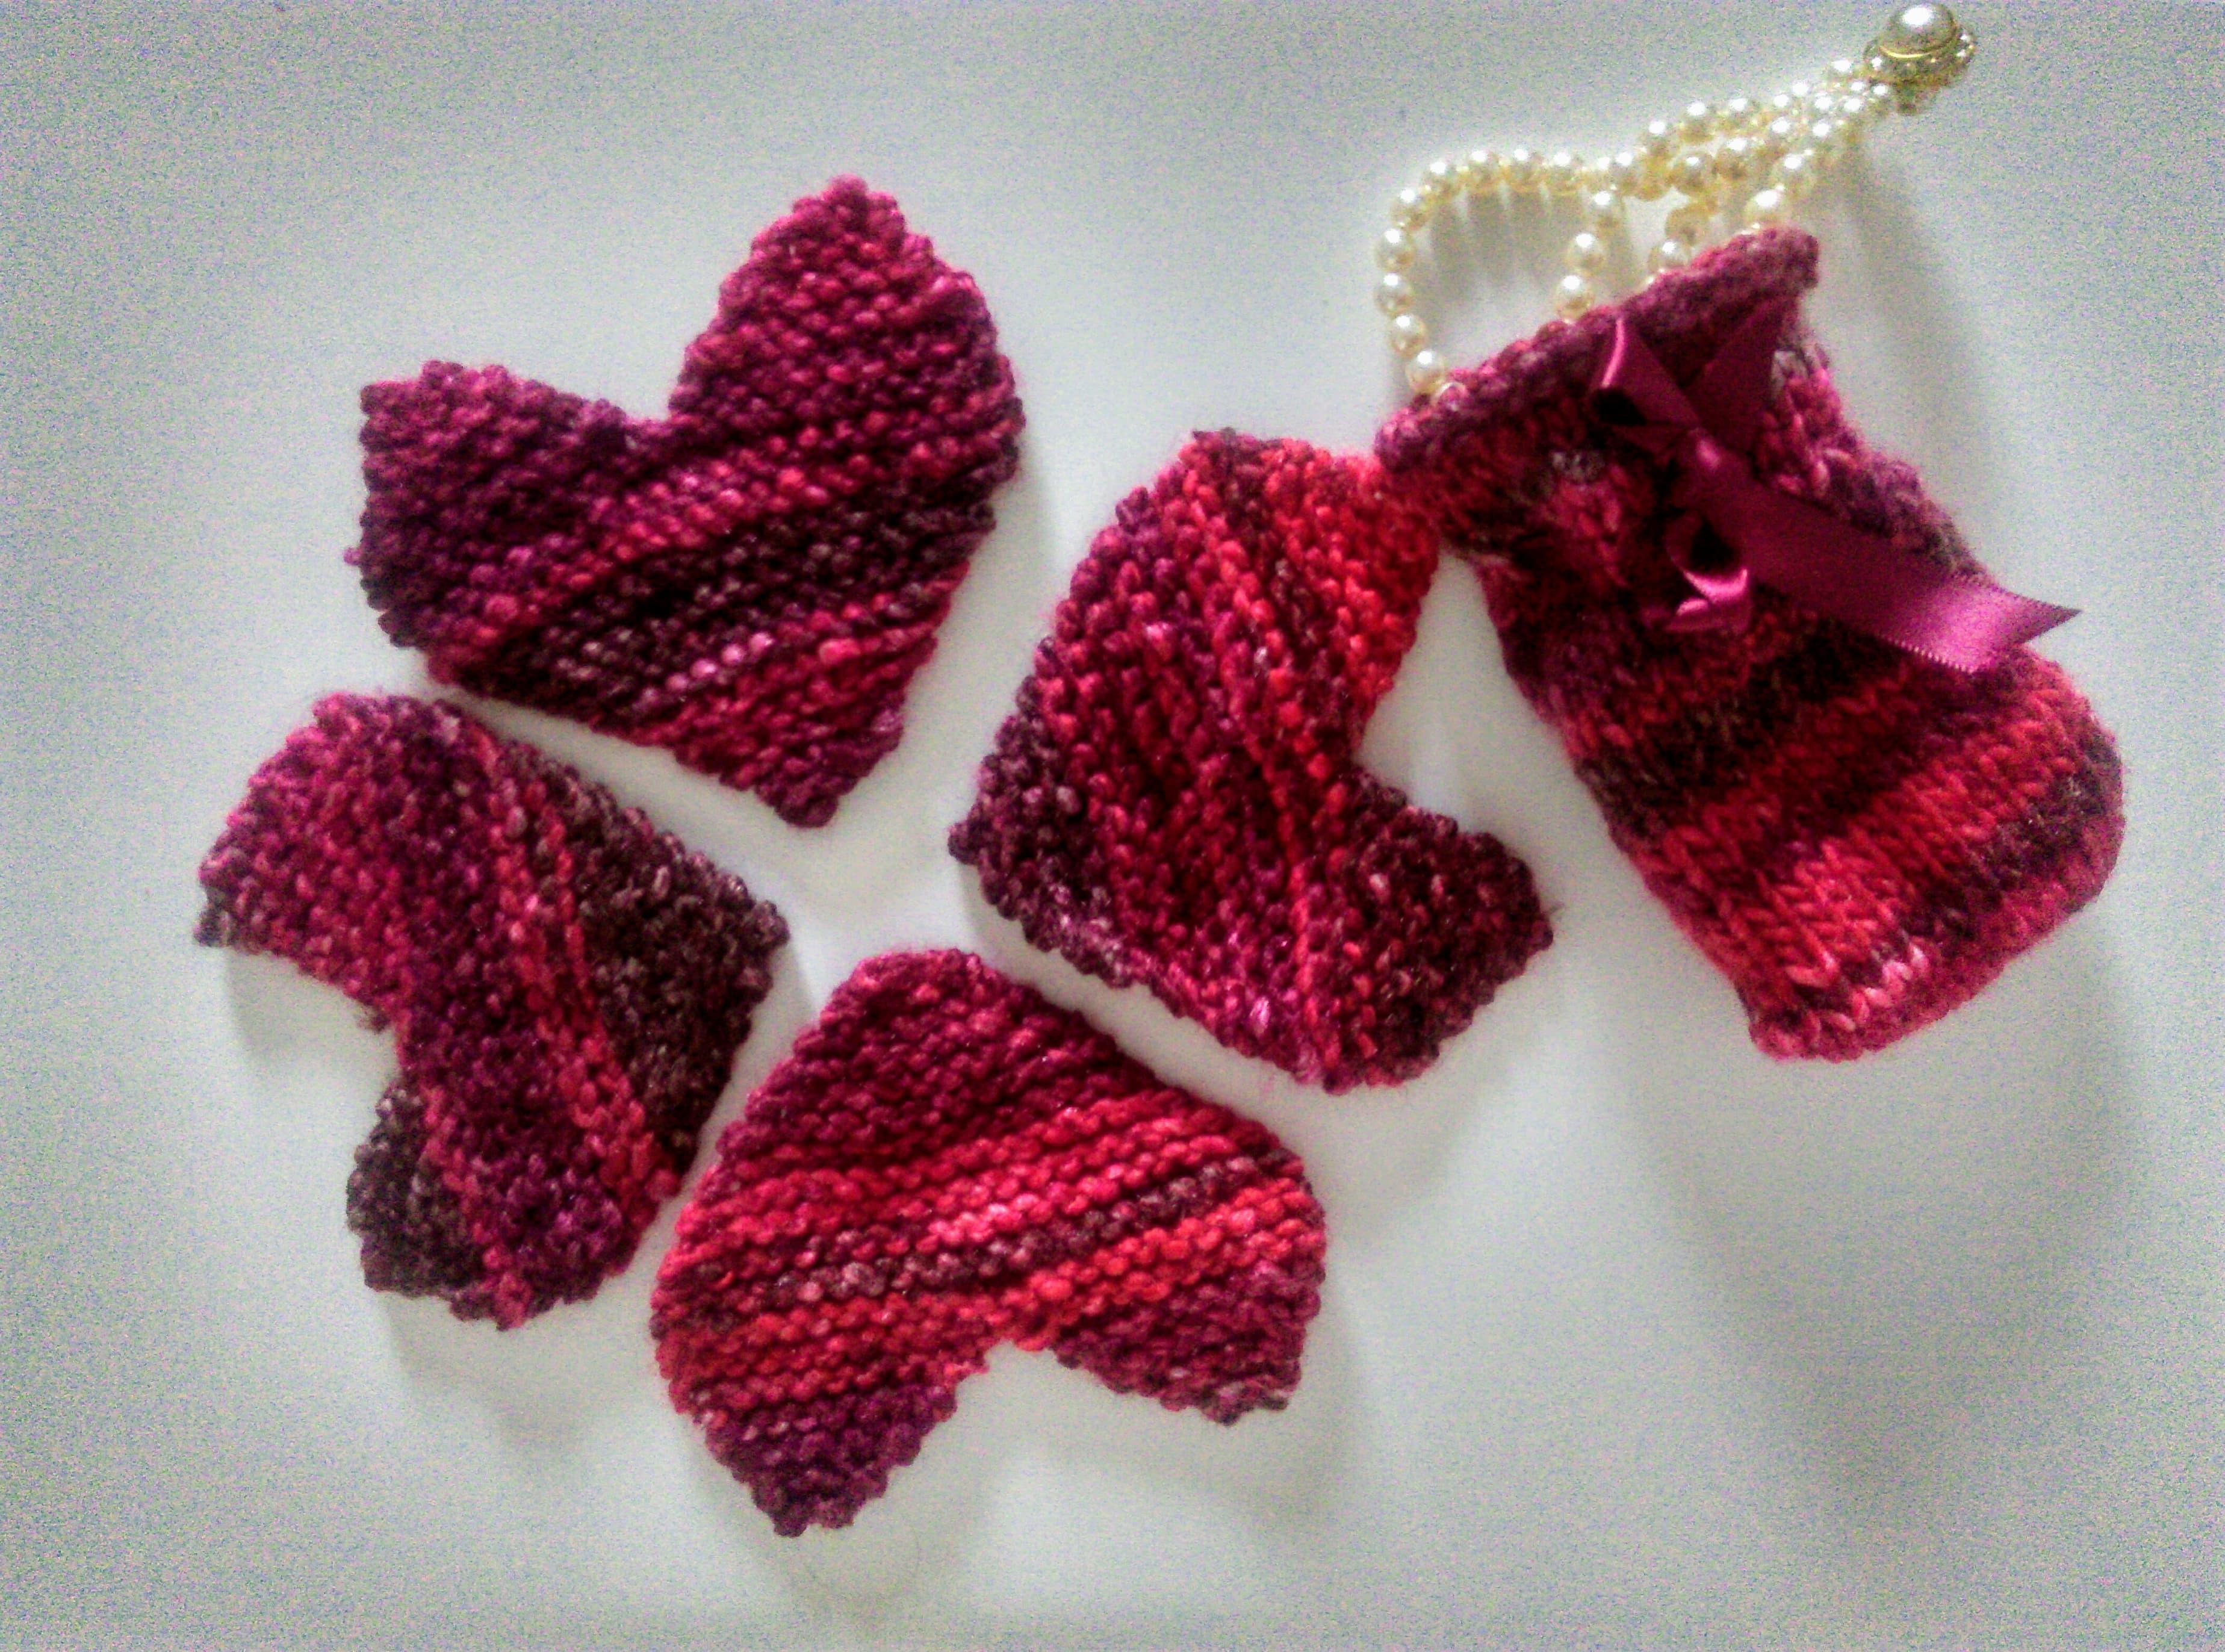 knitting-heart-shaped-coasters